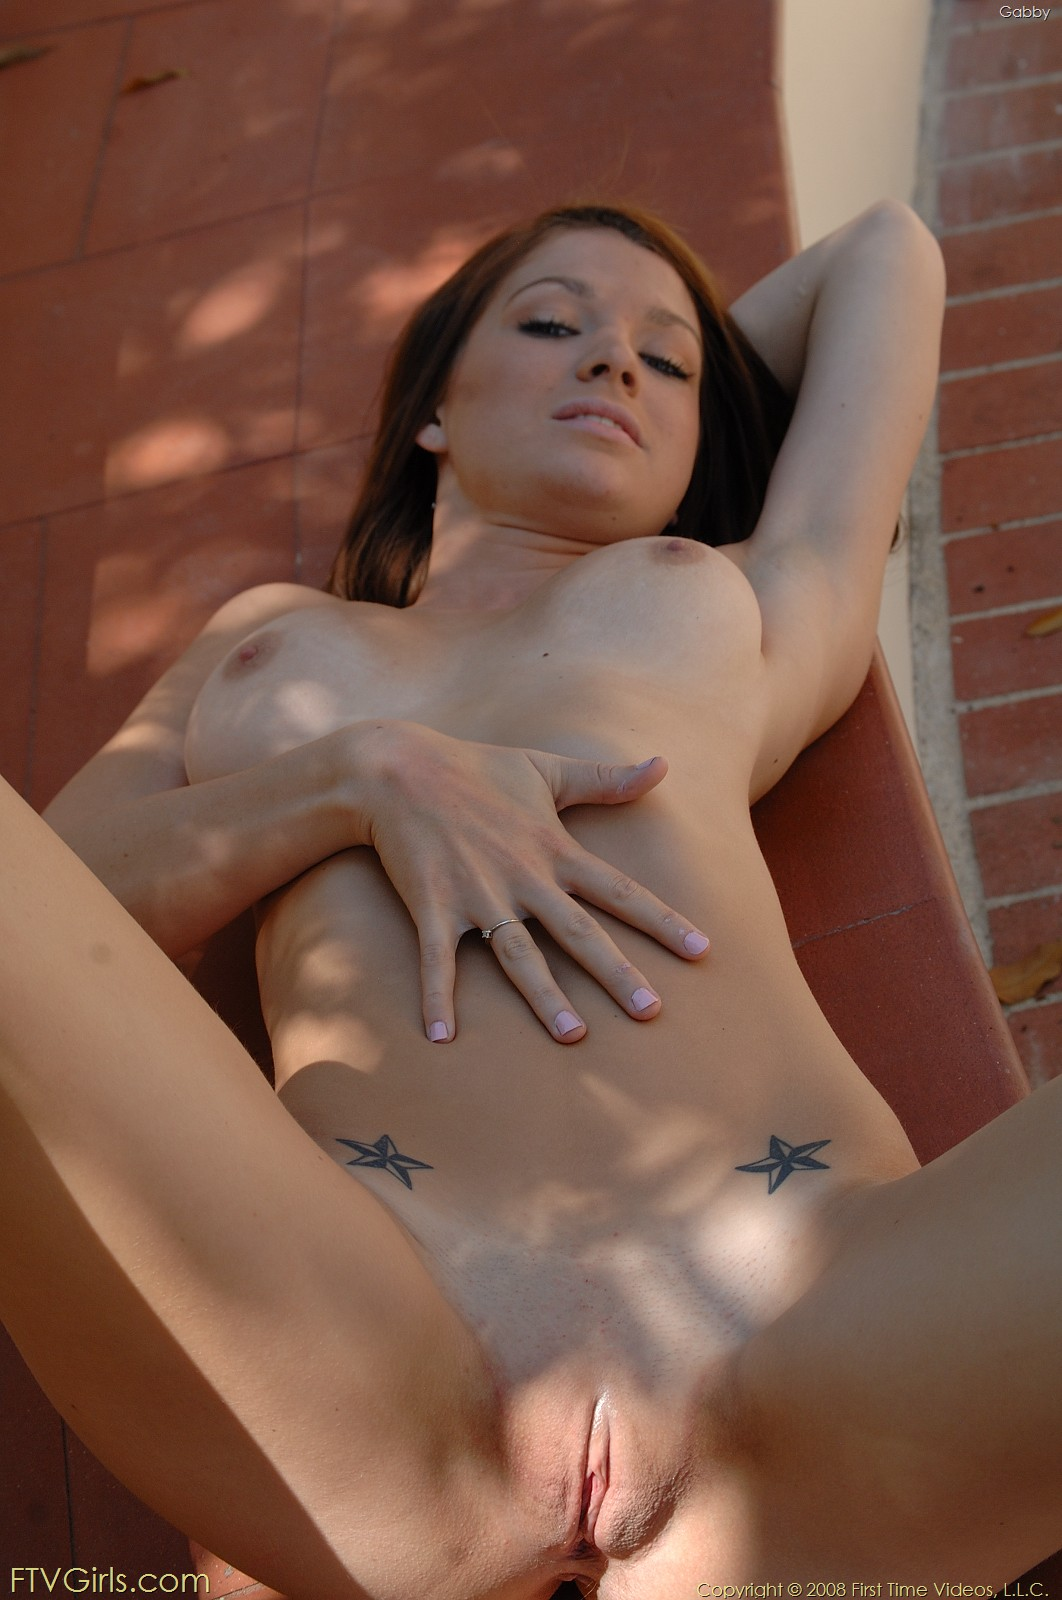 Nude gaby ftv clips